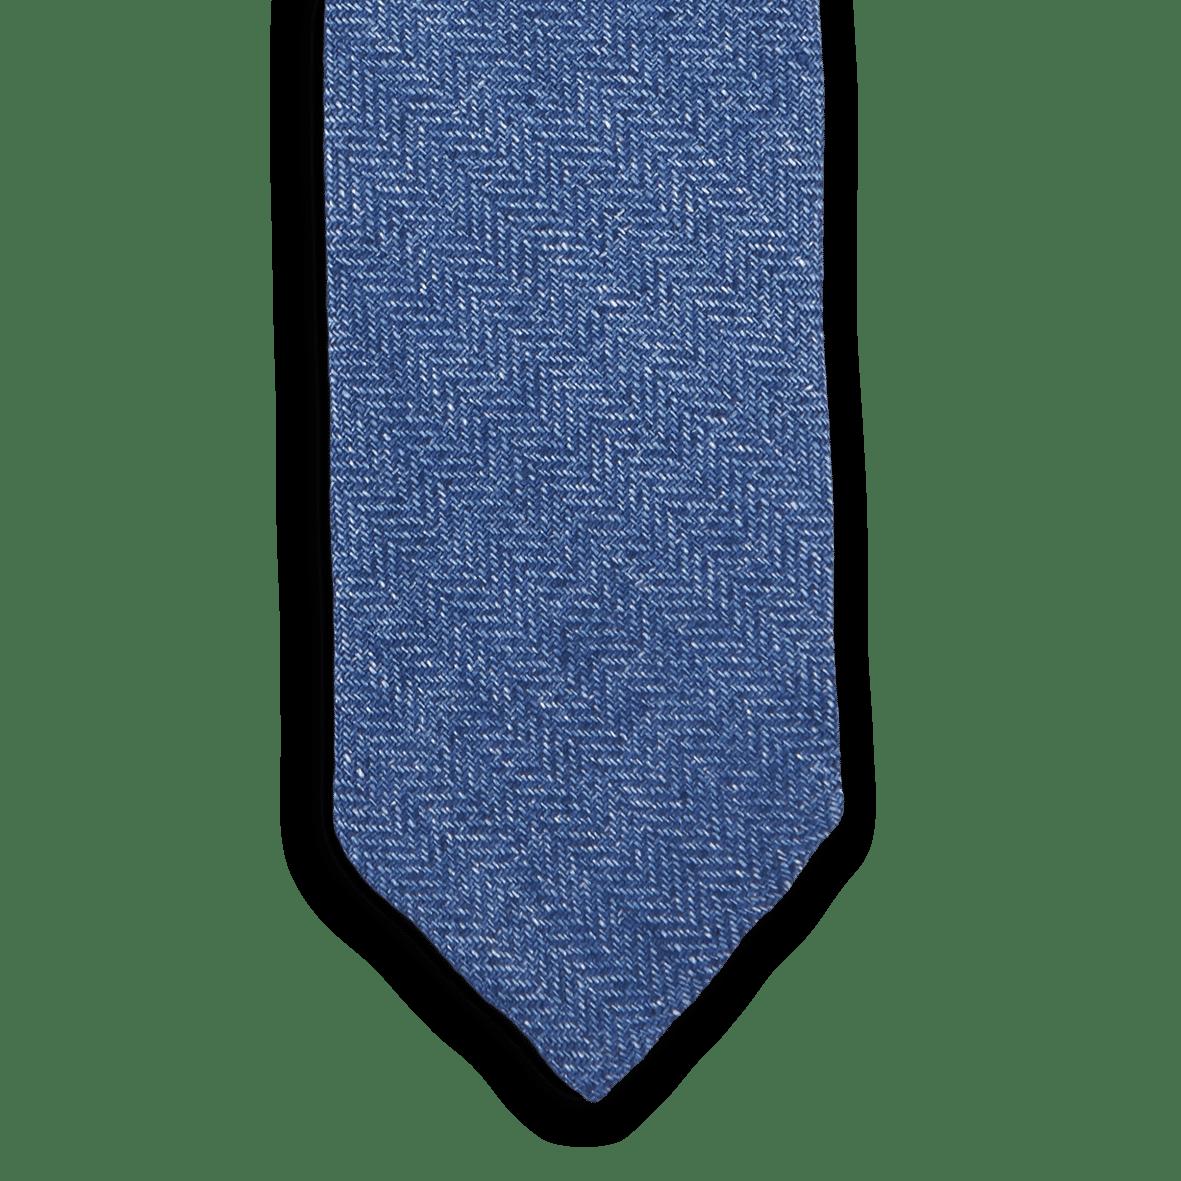 Drakes Blue Chevron Woven Linen Tie Front